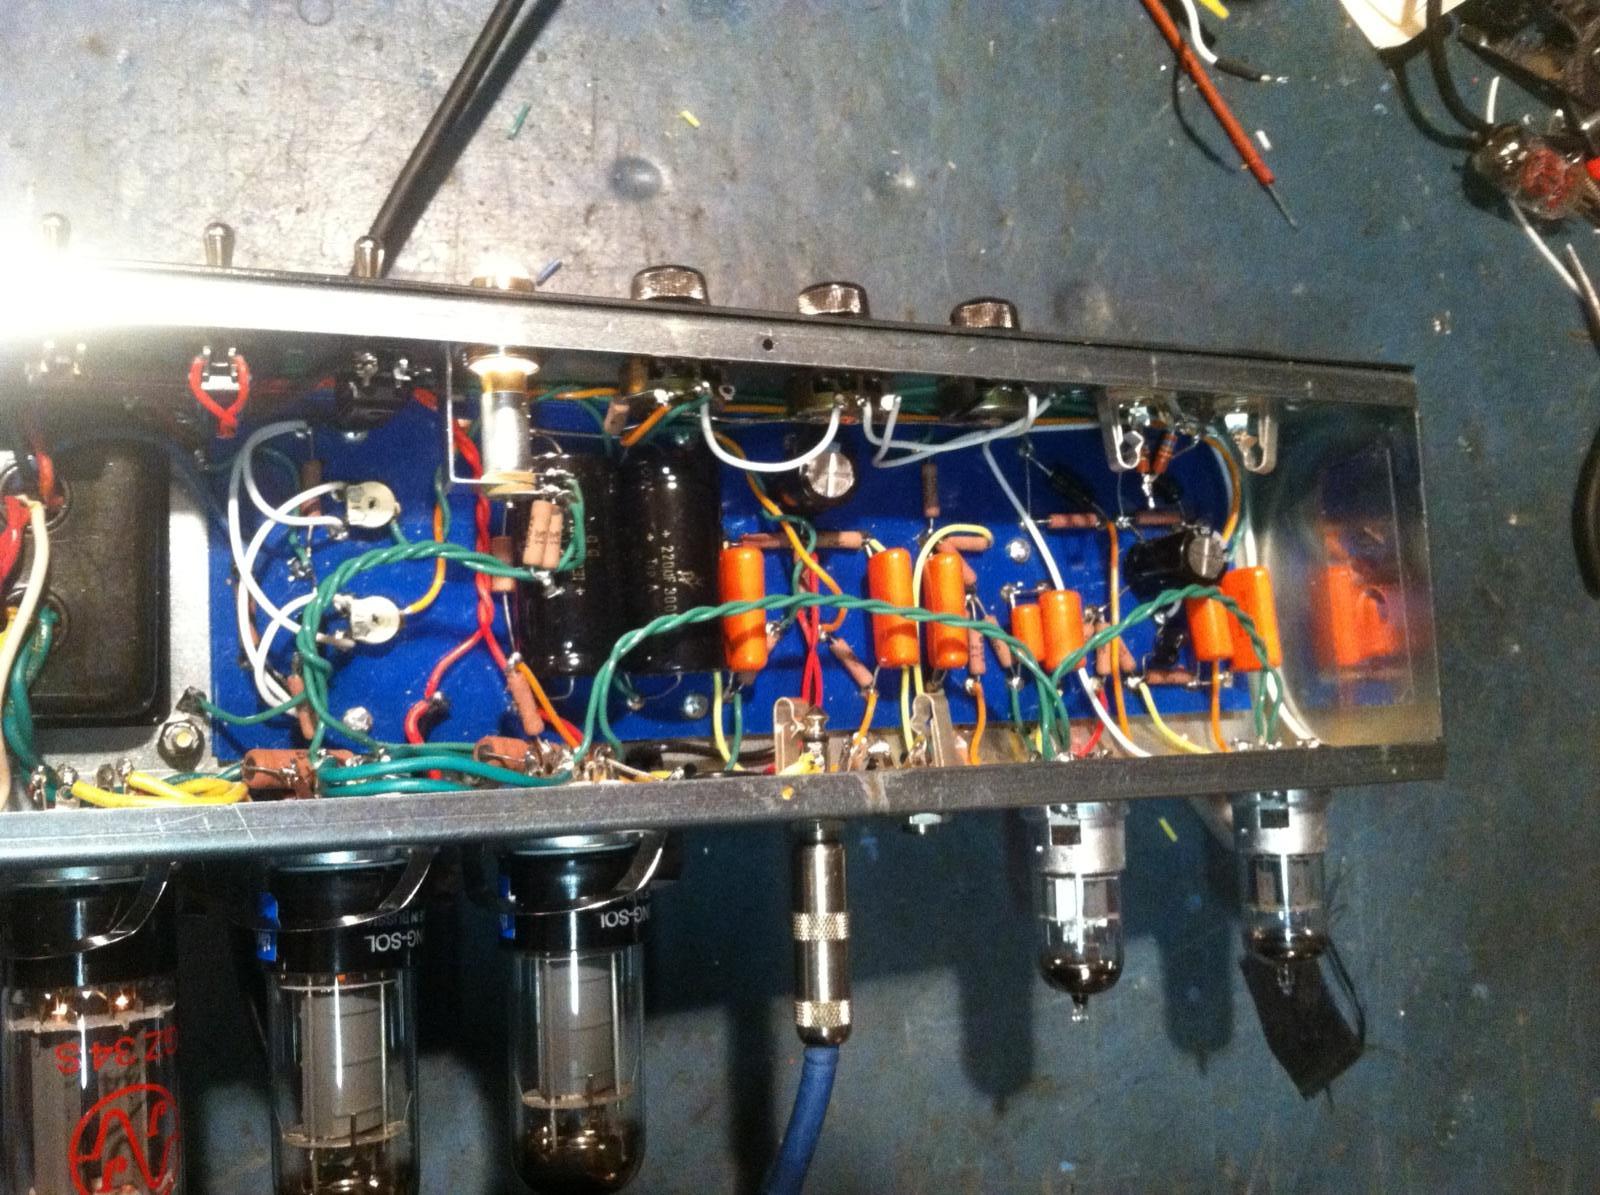 Some of Dan's gorgeous handiwork, in an amp he designed himself nonetheless!